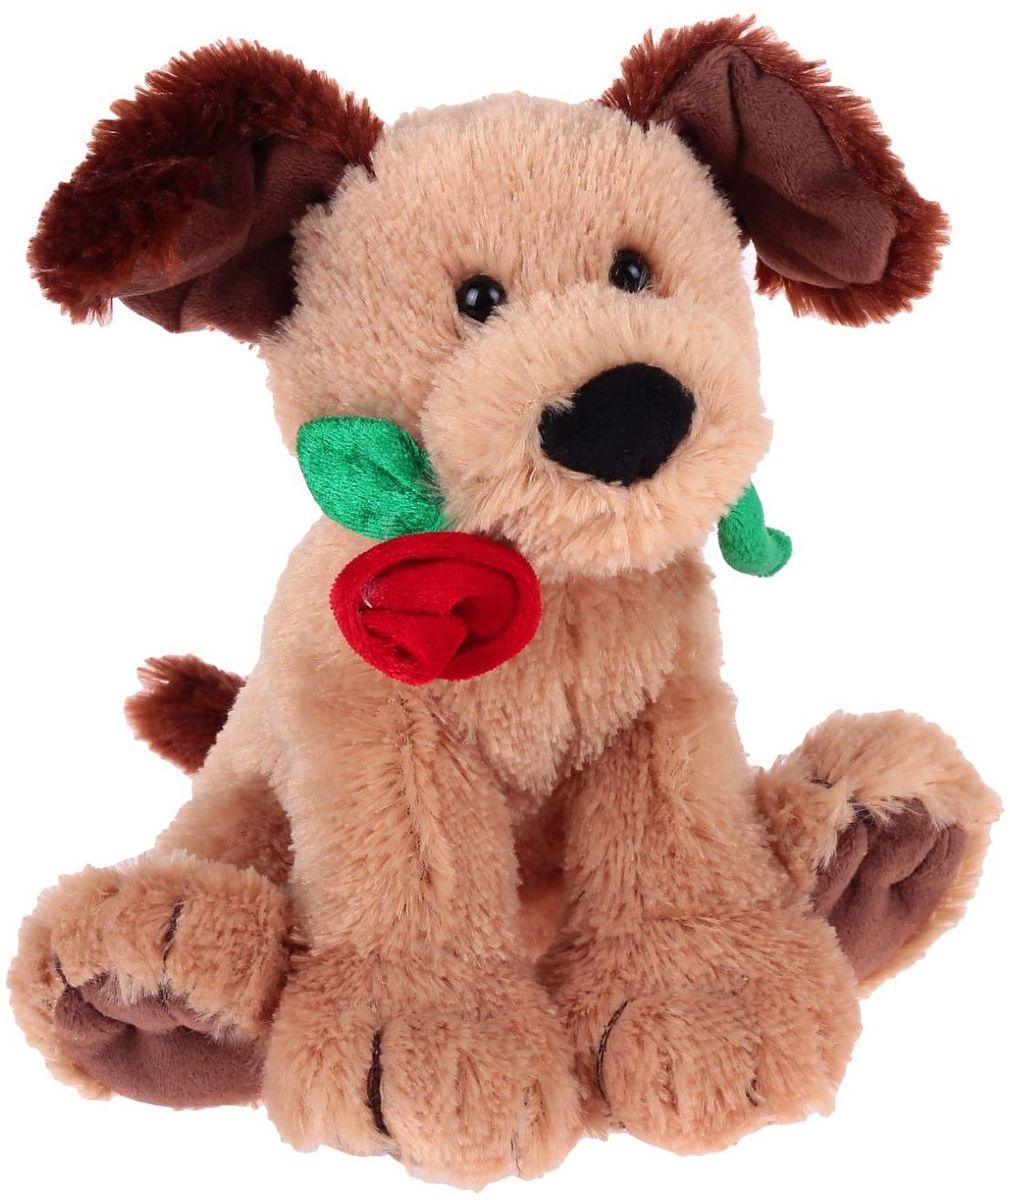 Gund Мягкая игрушка Собака Deangleo 21,5 см 2245500 gund мягкая игрушка deangleo 21 5 см